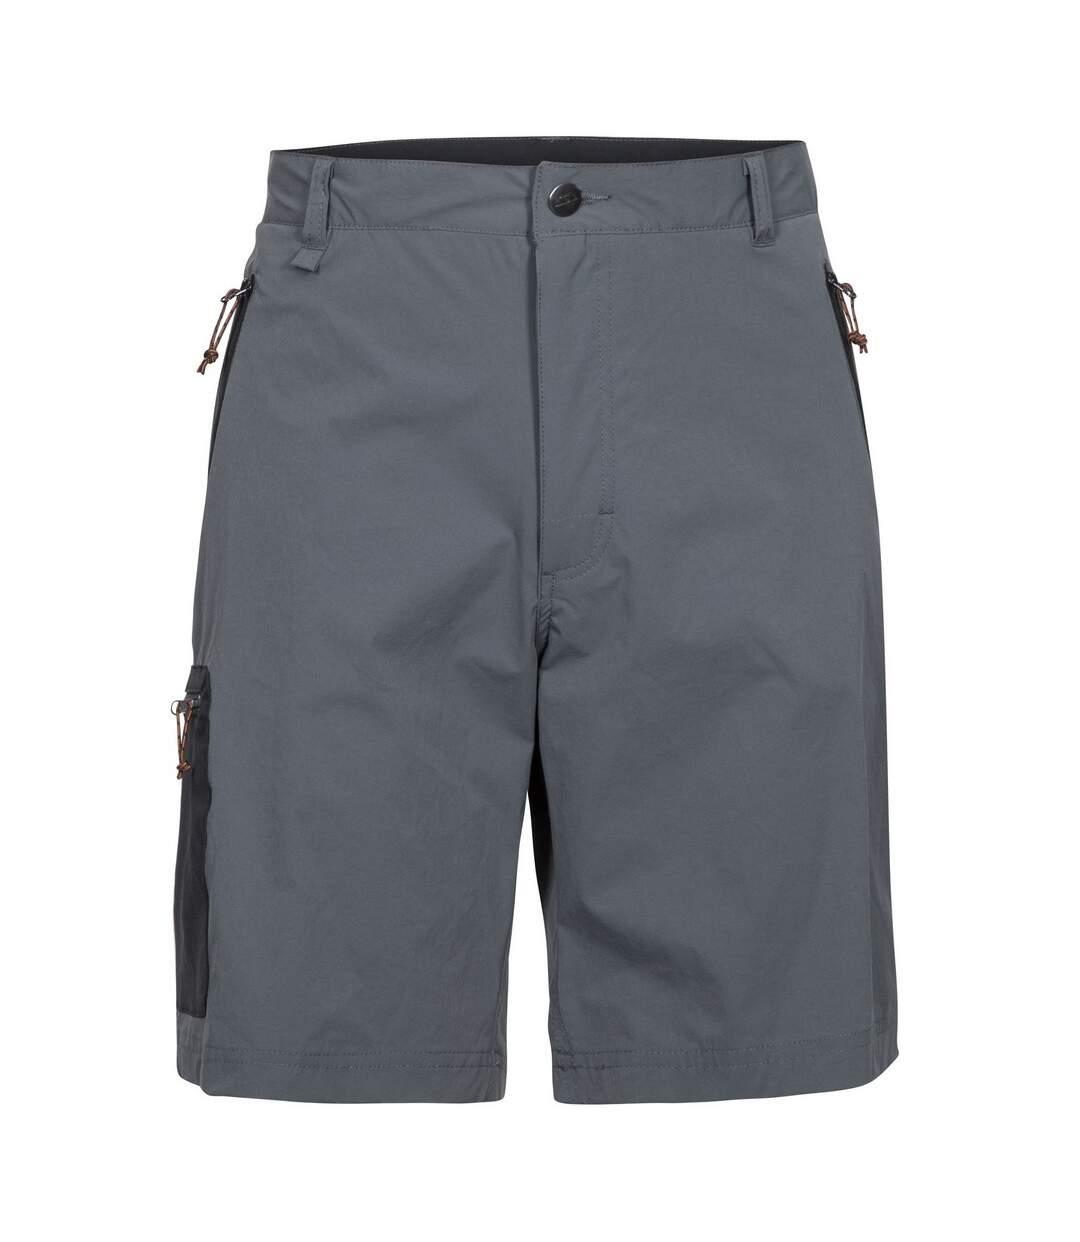 Trespass Mens Runnel Hiking Shorts (Carbon) - UTTP4141